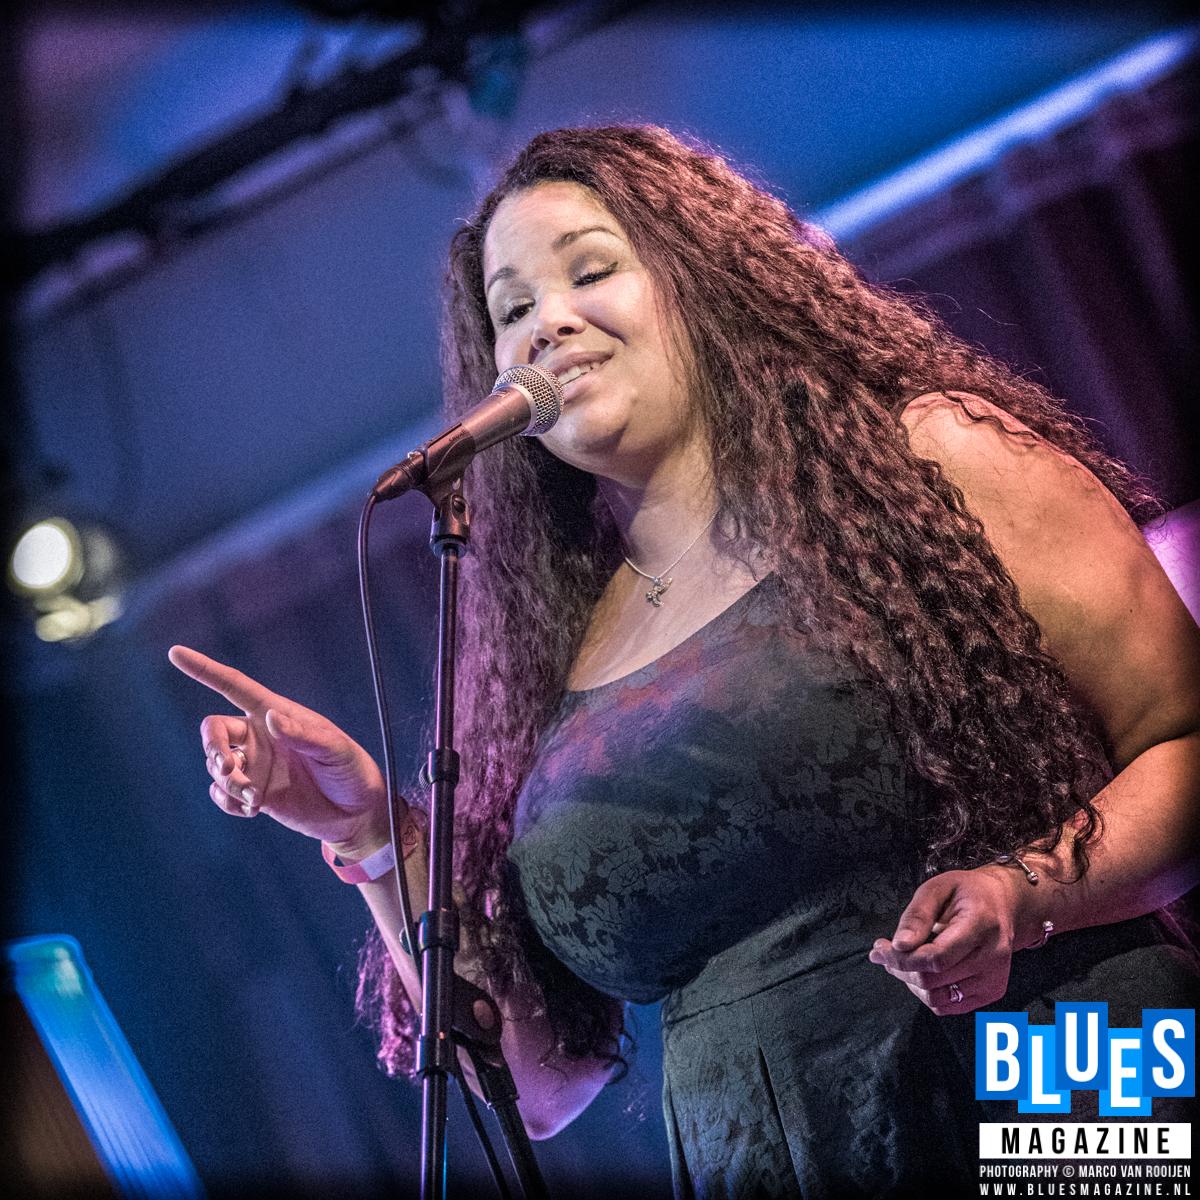 Flirting with The Blues 2017 - Kyla Brox